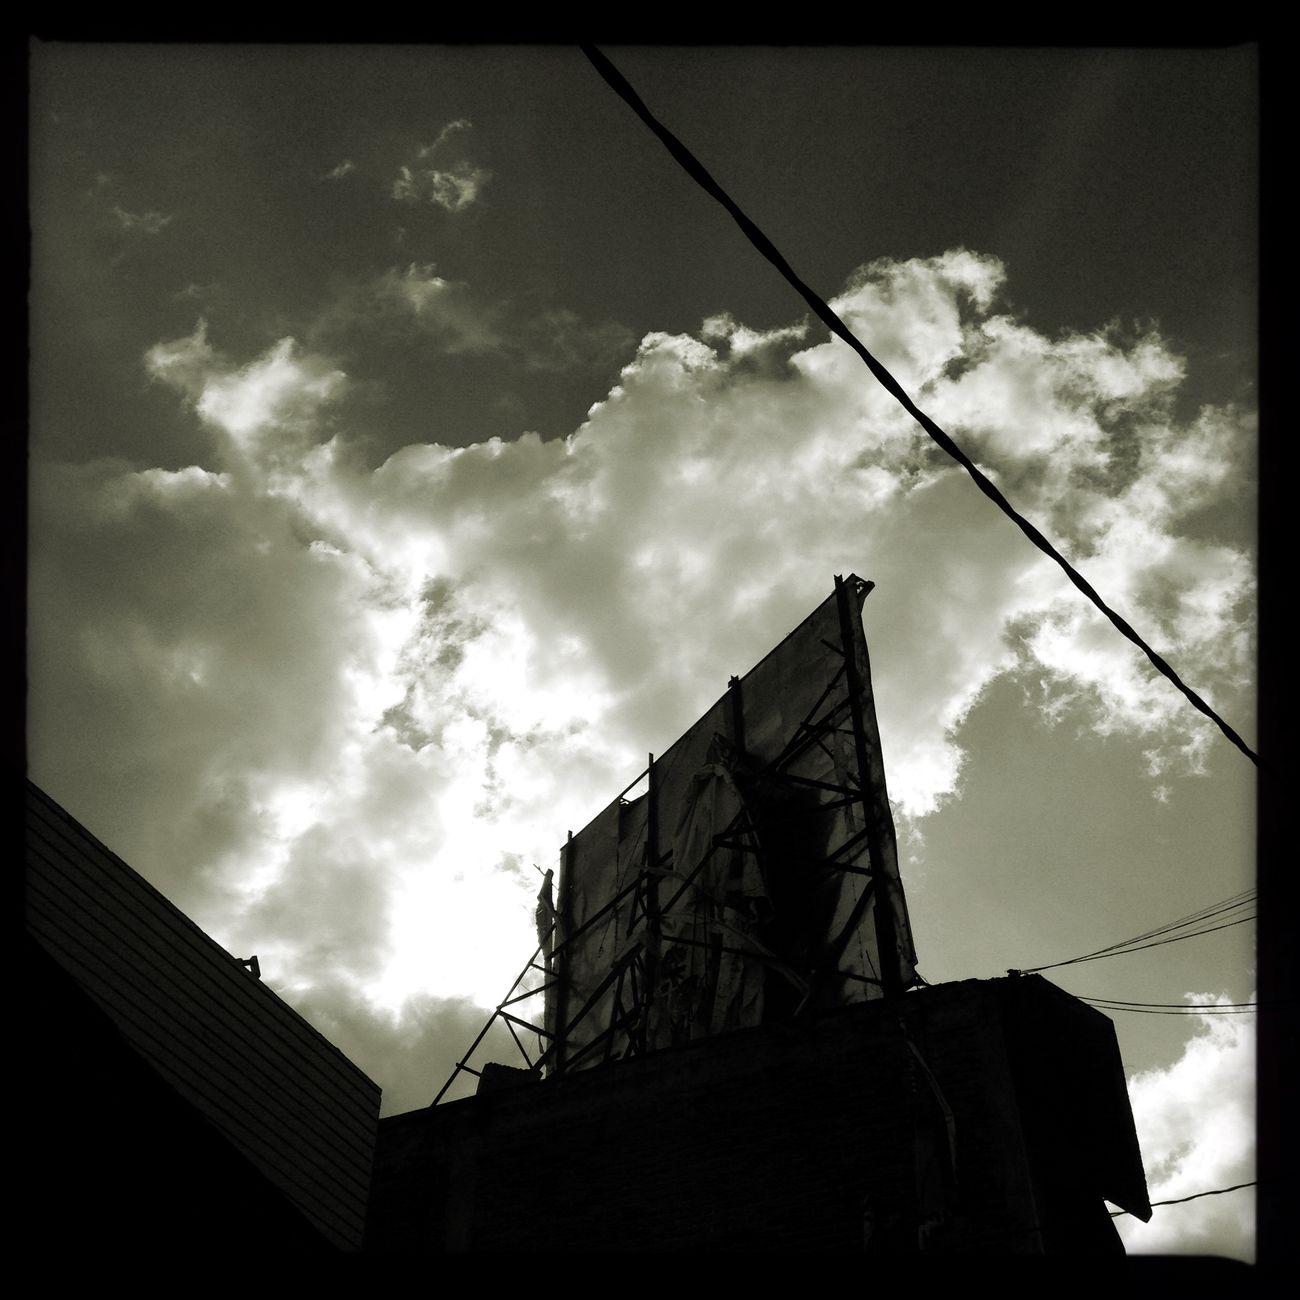 Escafandra - La Barranca Streetphotography IPhoneography Urban@ndante